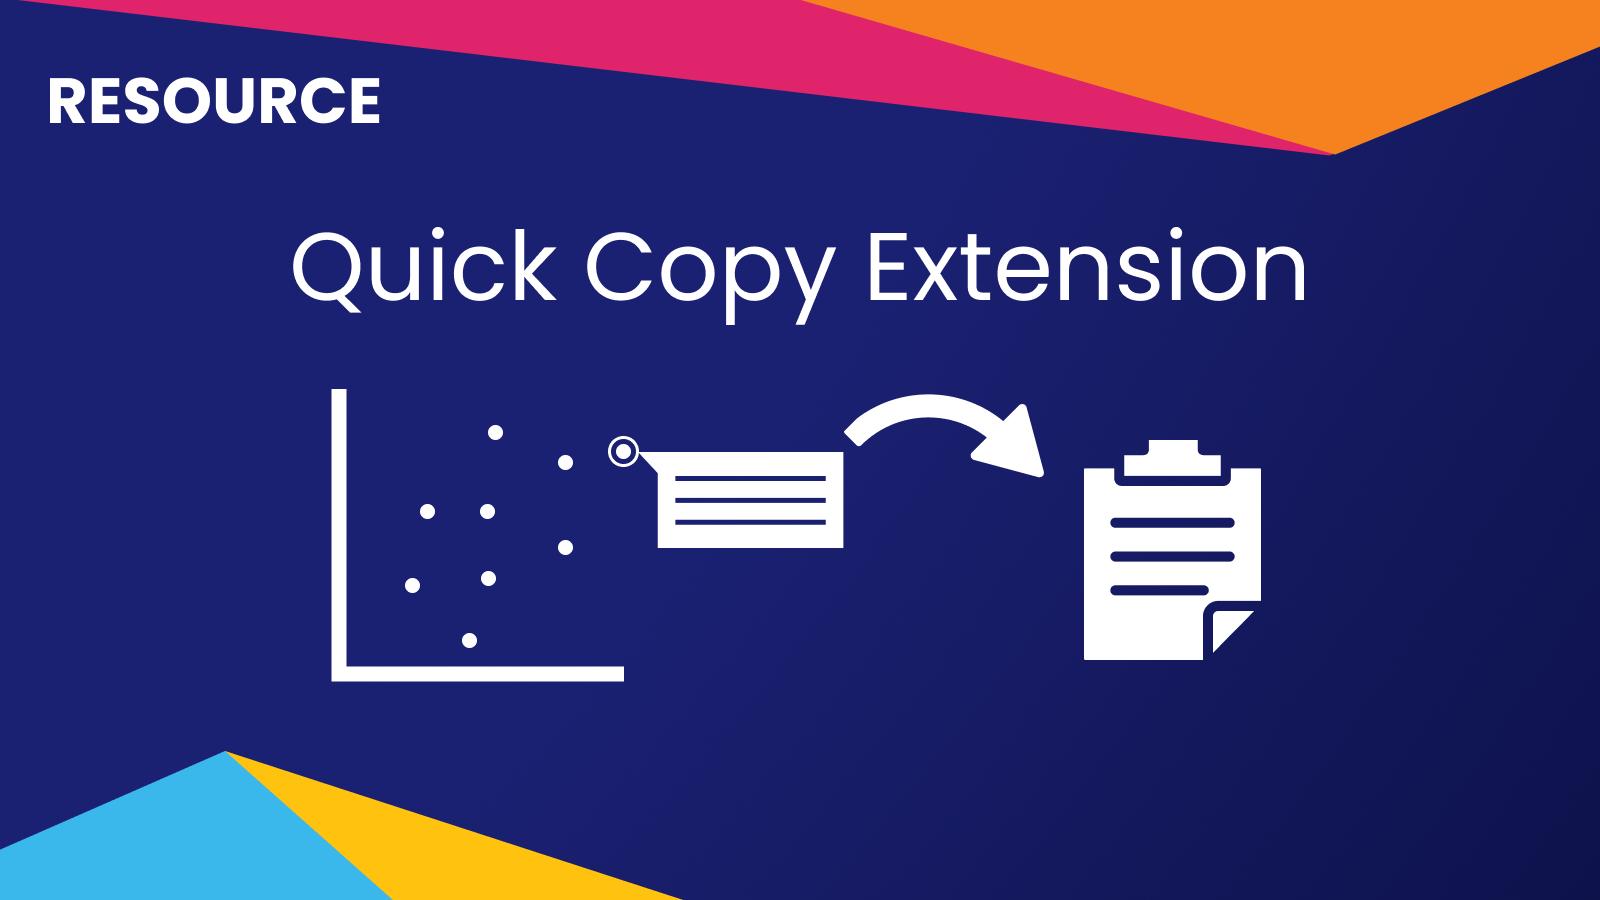 Quick Copy Extension